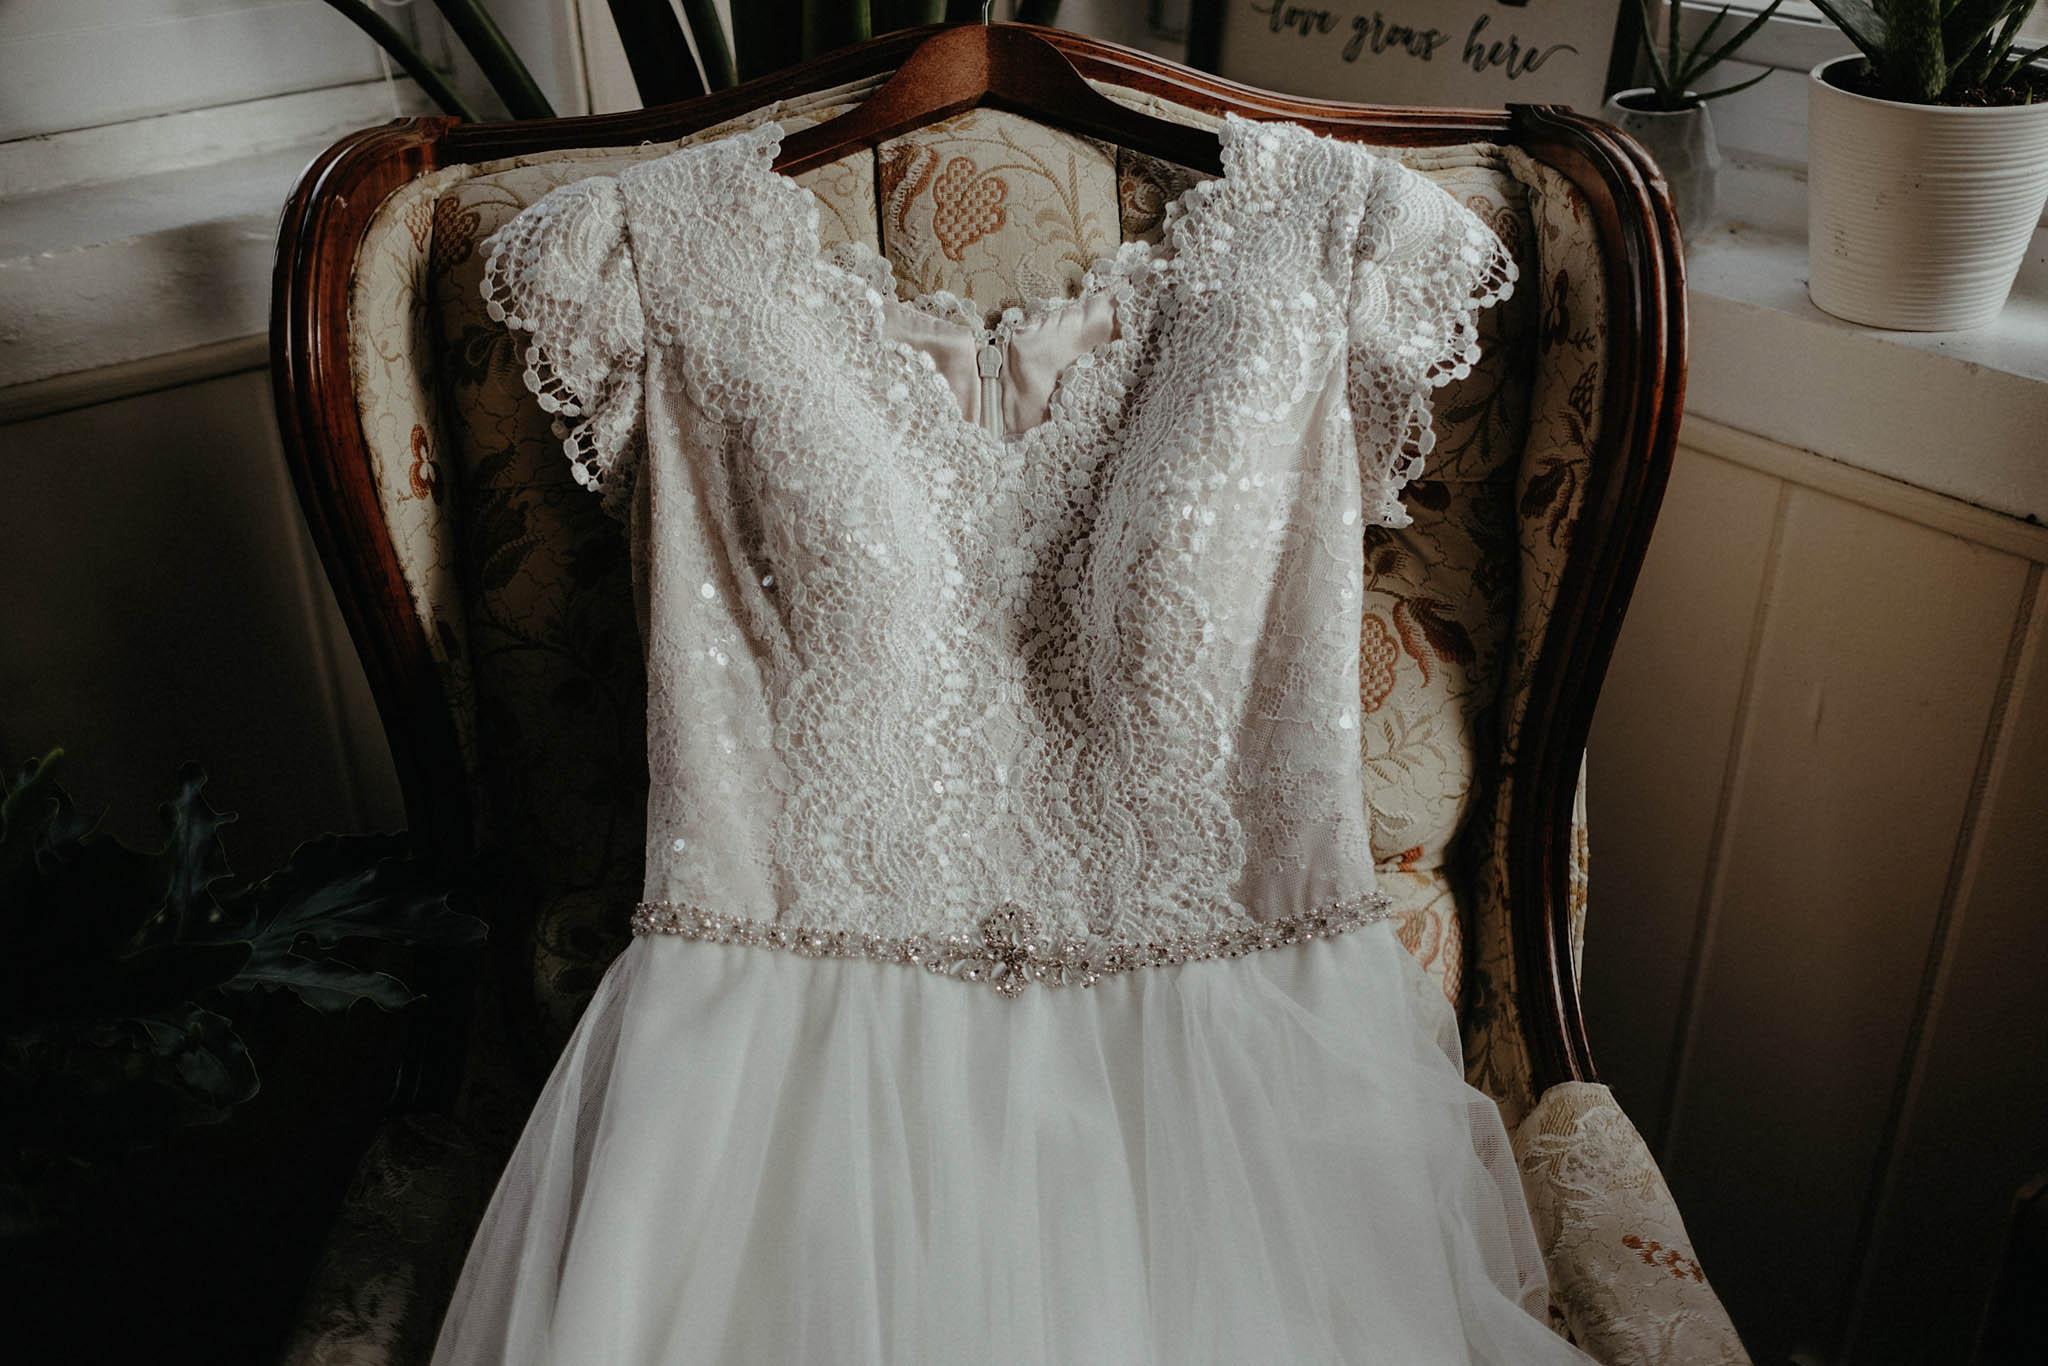 cincinnati warehouse wedding bride wedding dress in chair